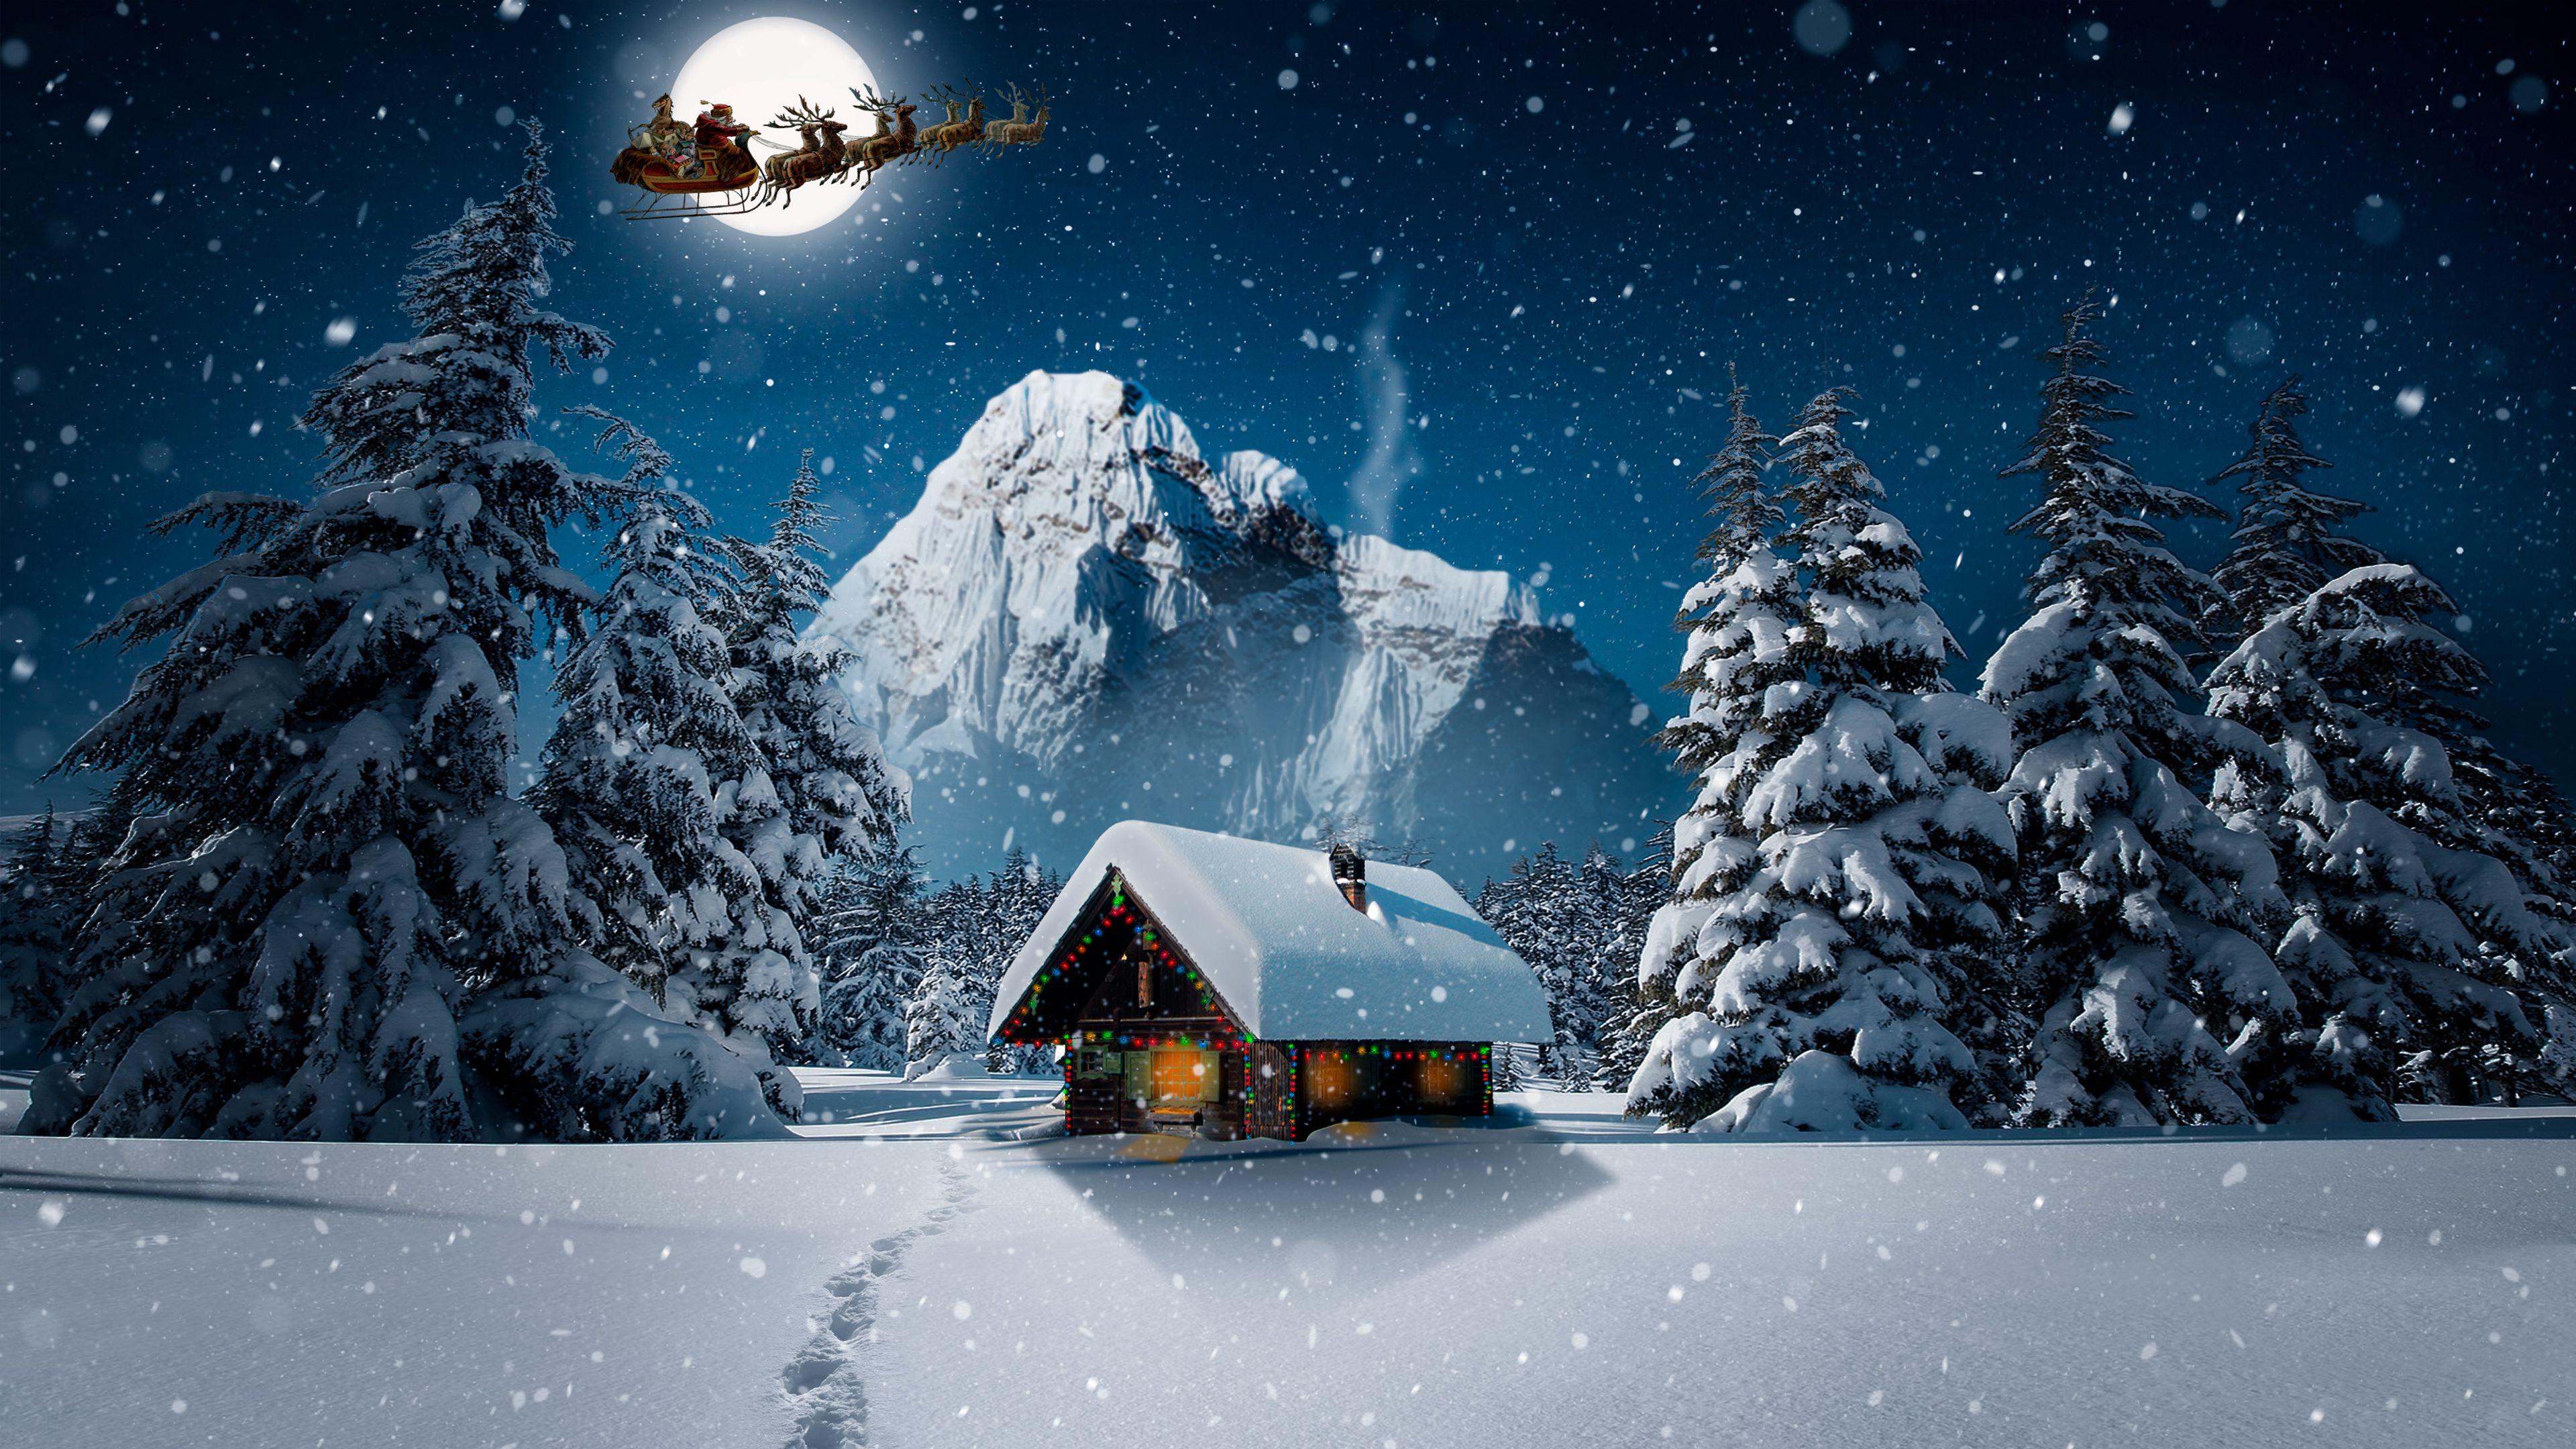 Christmas Winter 4k Wallpaper Christmas Wallpaper Nature Wallpaper